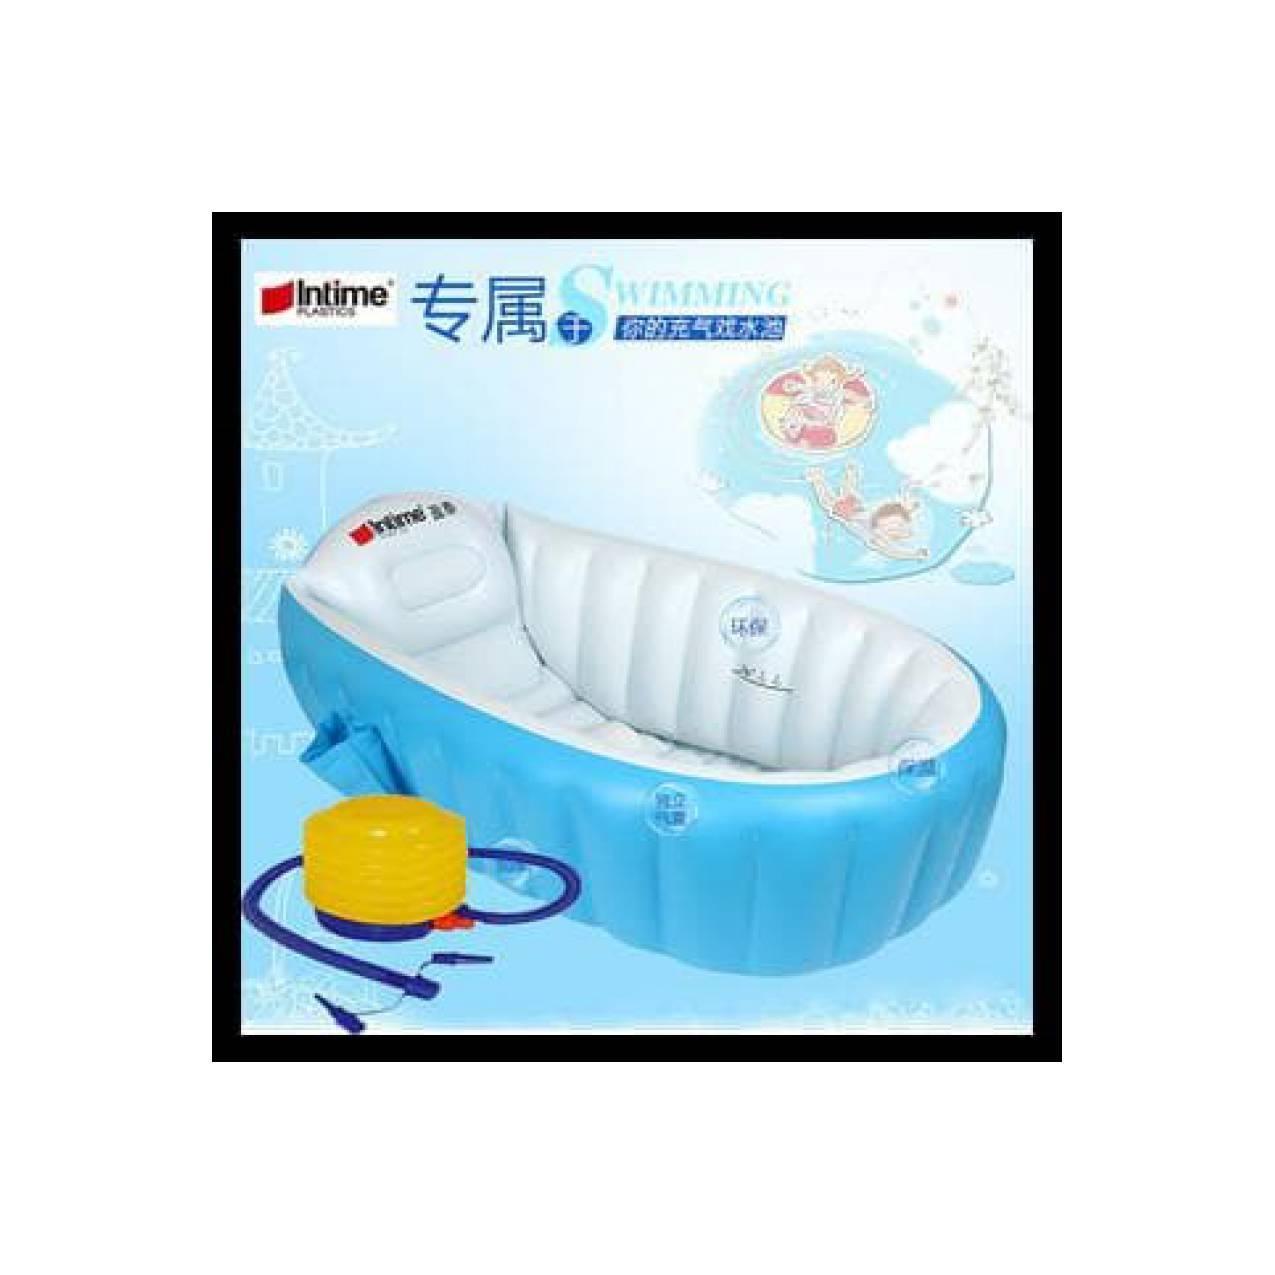 Paket Intime Baby Bath Tub Blue Pompa Bestway 5 Inch Bak Mandibayi Tempat Mandi Bayi Shinpo Paradise 601 51125 Source Biru